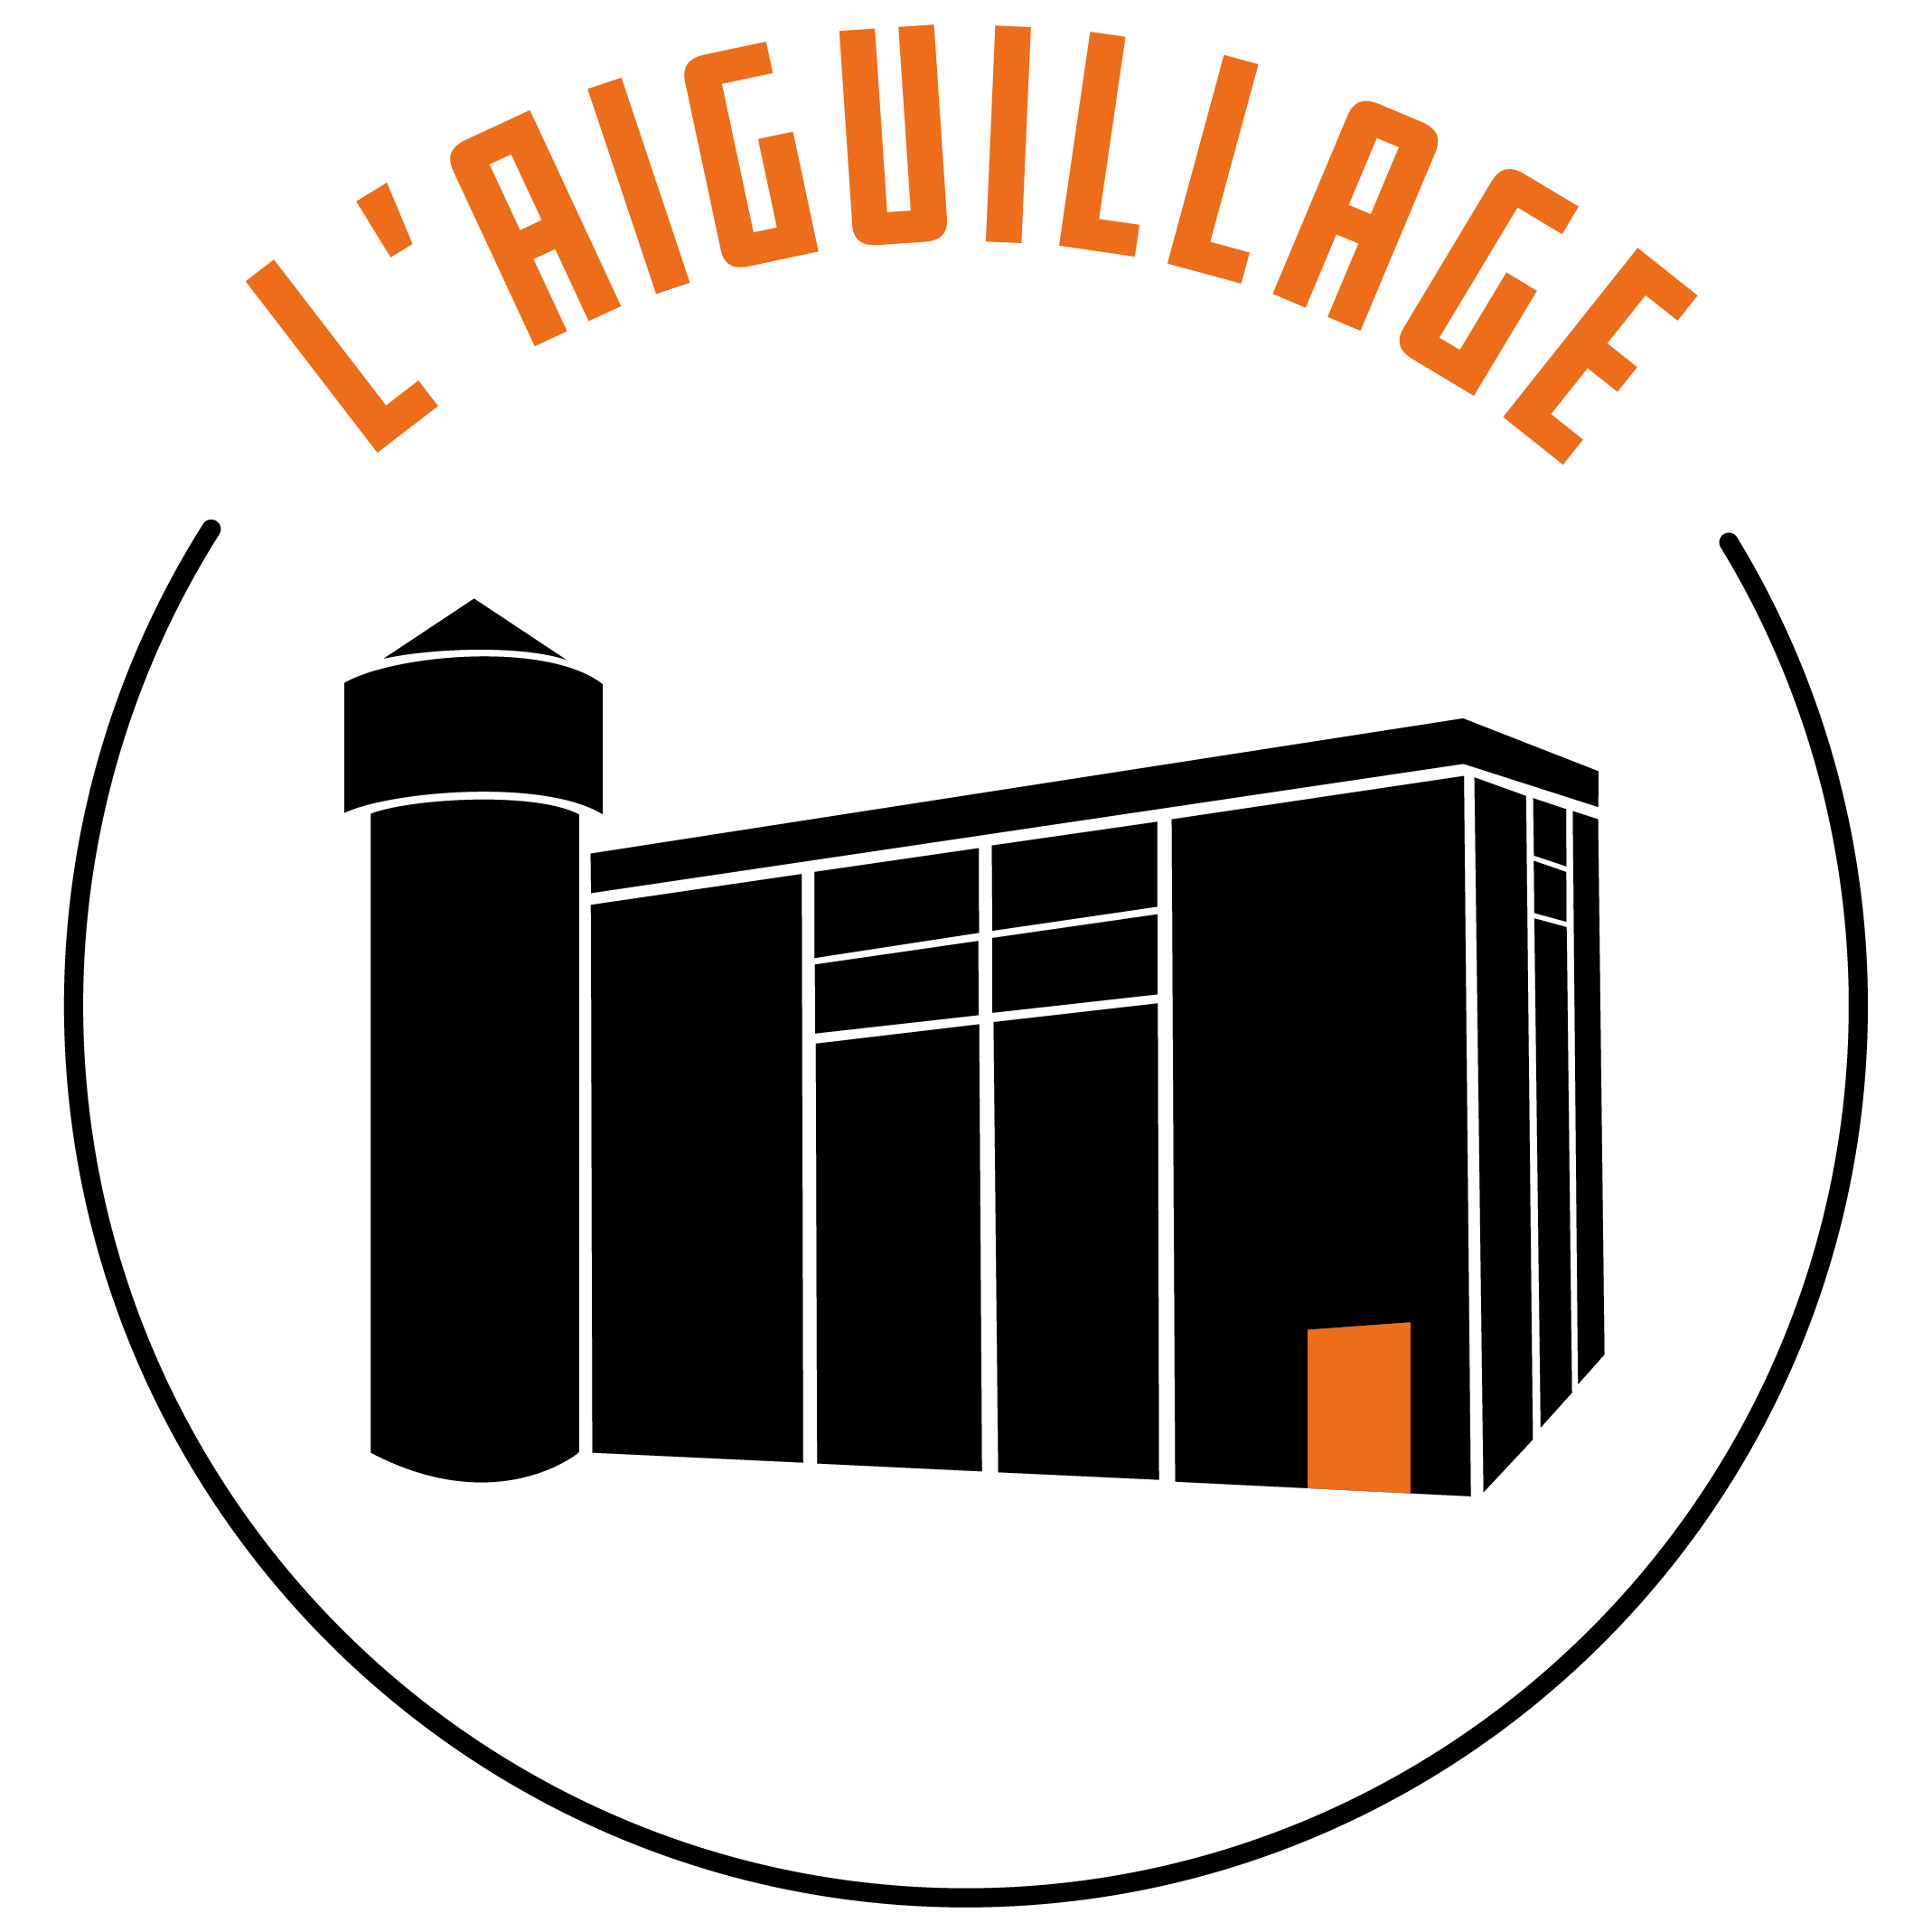 Aiguillage